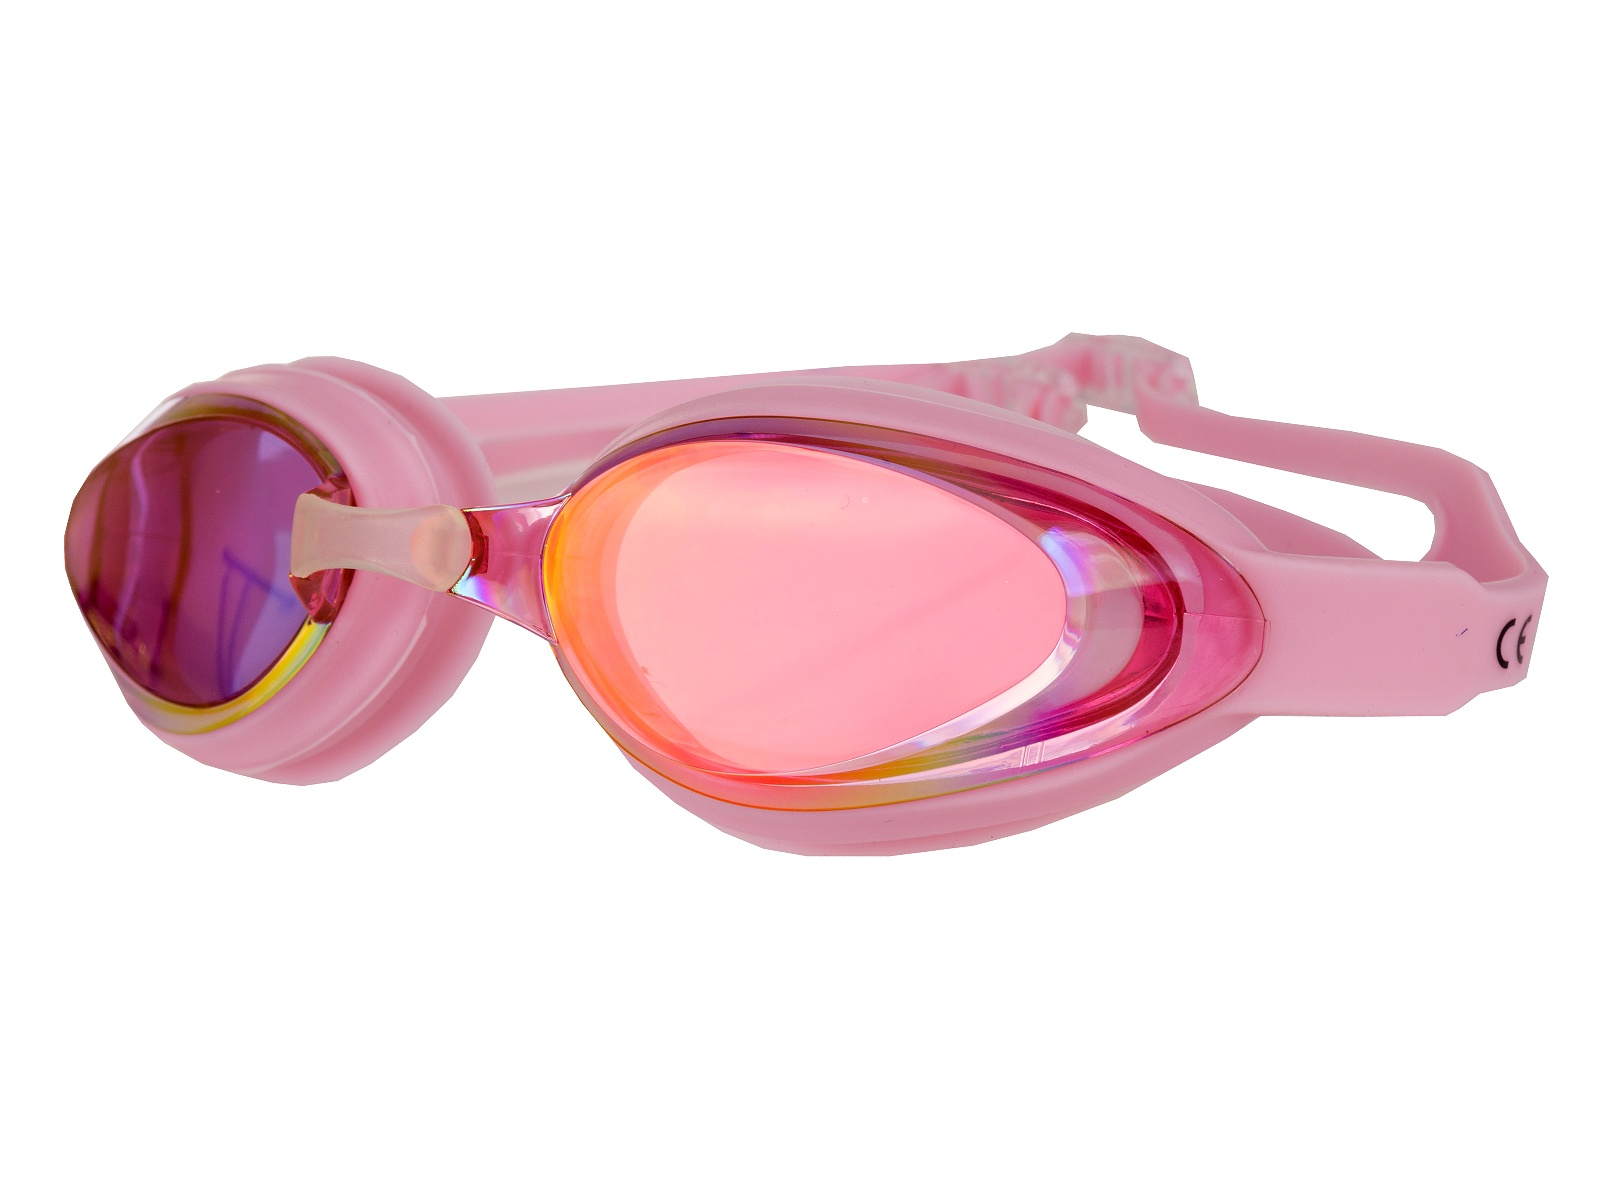 Plavecké brýle SPOKEY Nimph - růžové